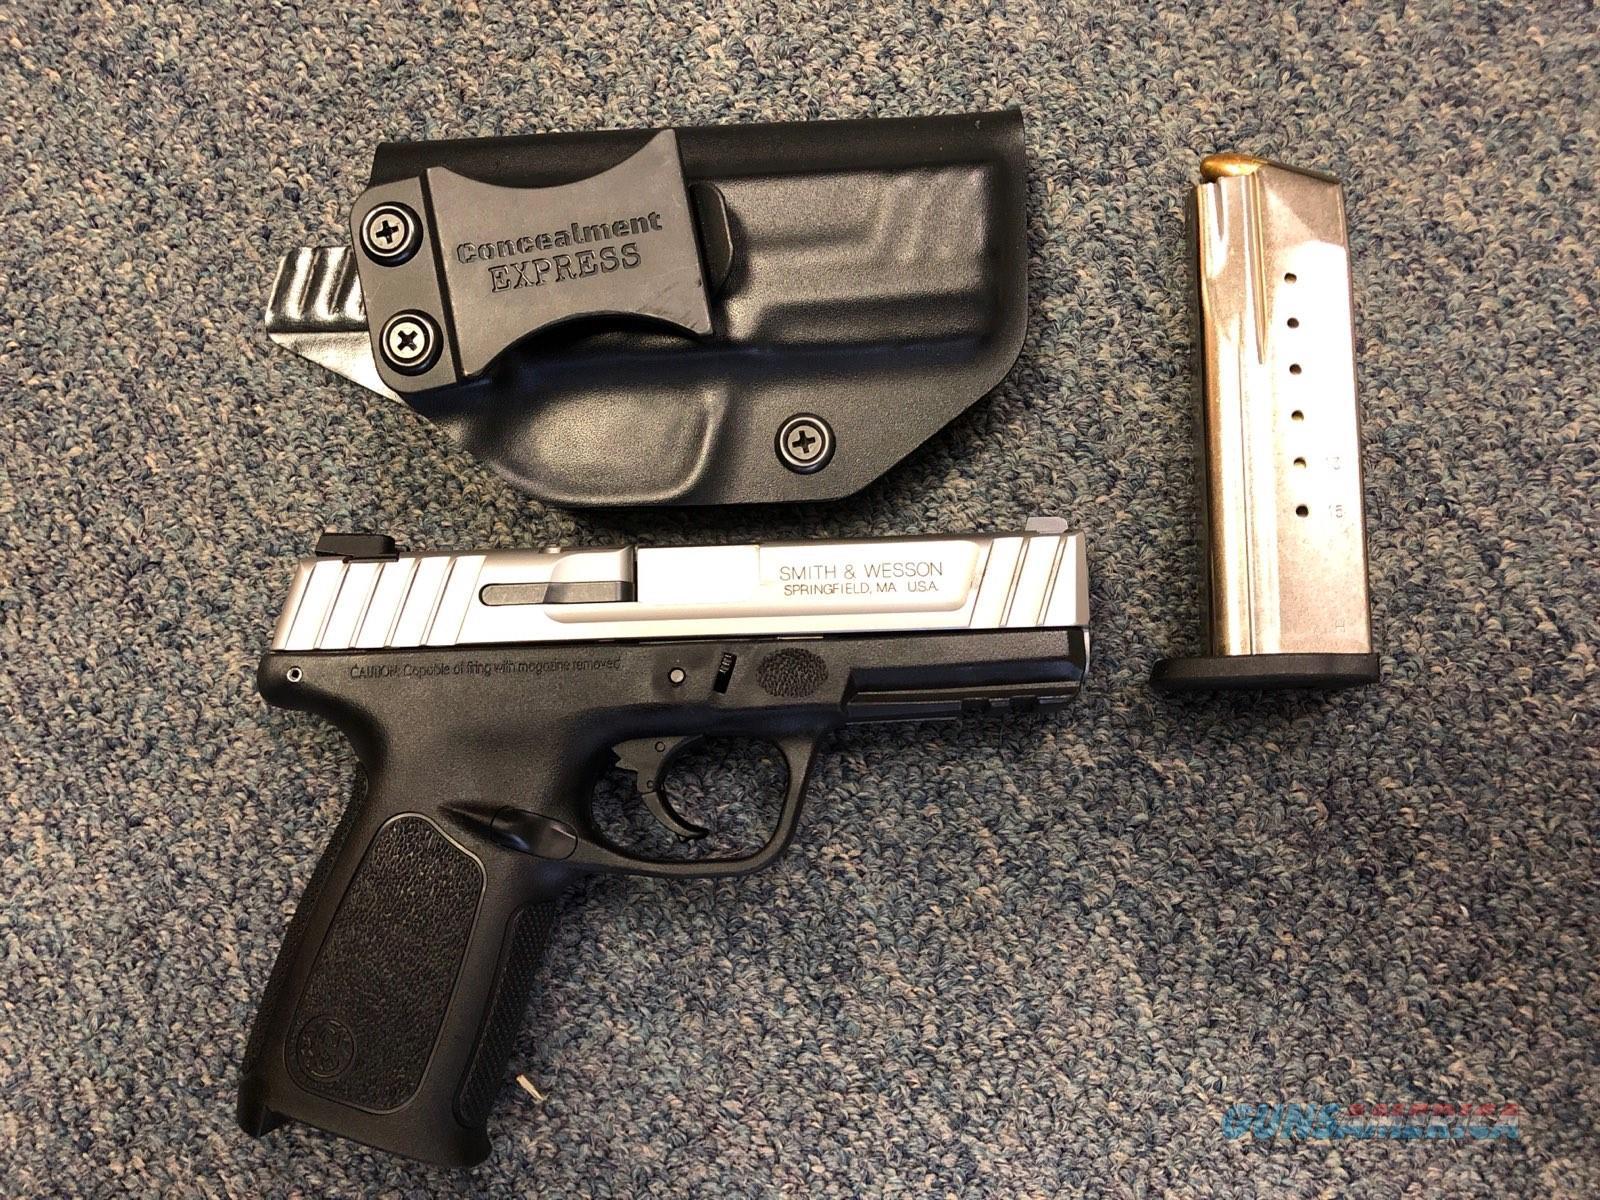 Smith & Wesson SDV9E 9mm  Guns > Pistols > Smith & Wesson Pistols - Autos > Polymer Frame